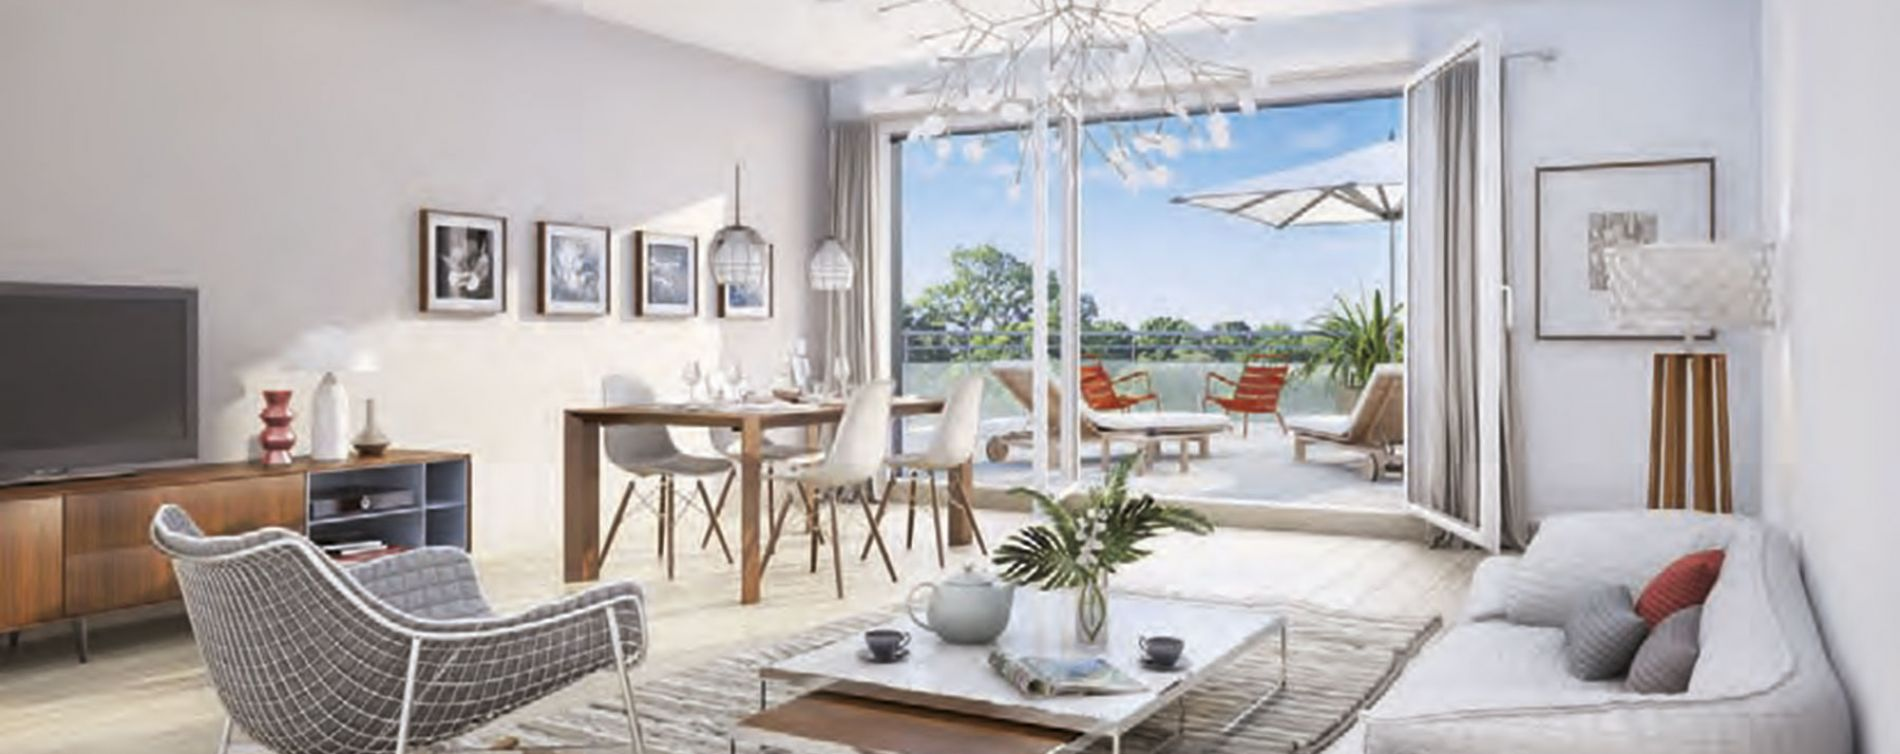 Bouguenais : programme immobilier neuve « Os'moz 2 » en Loi Pinel